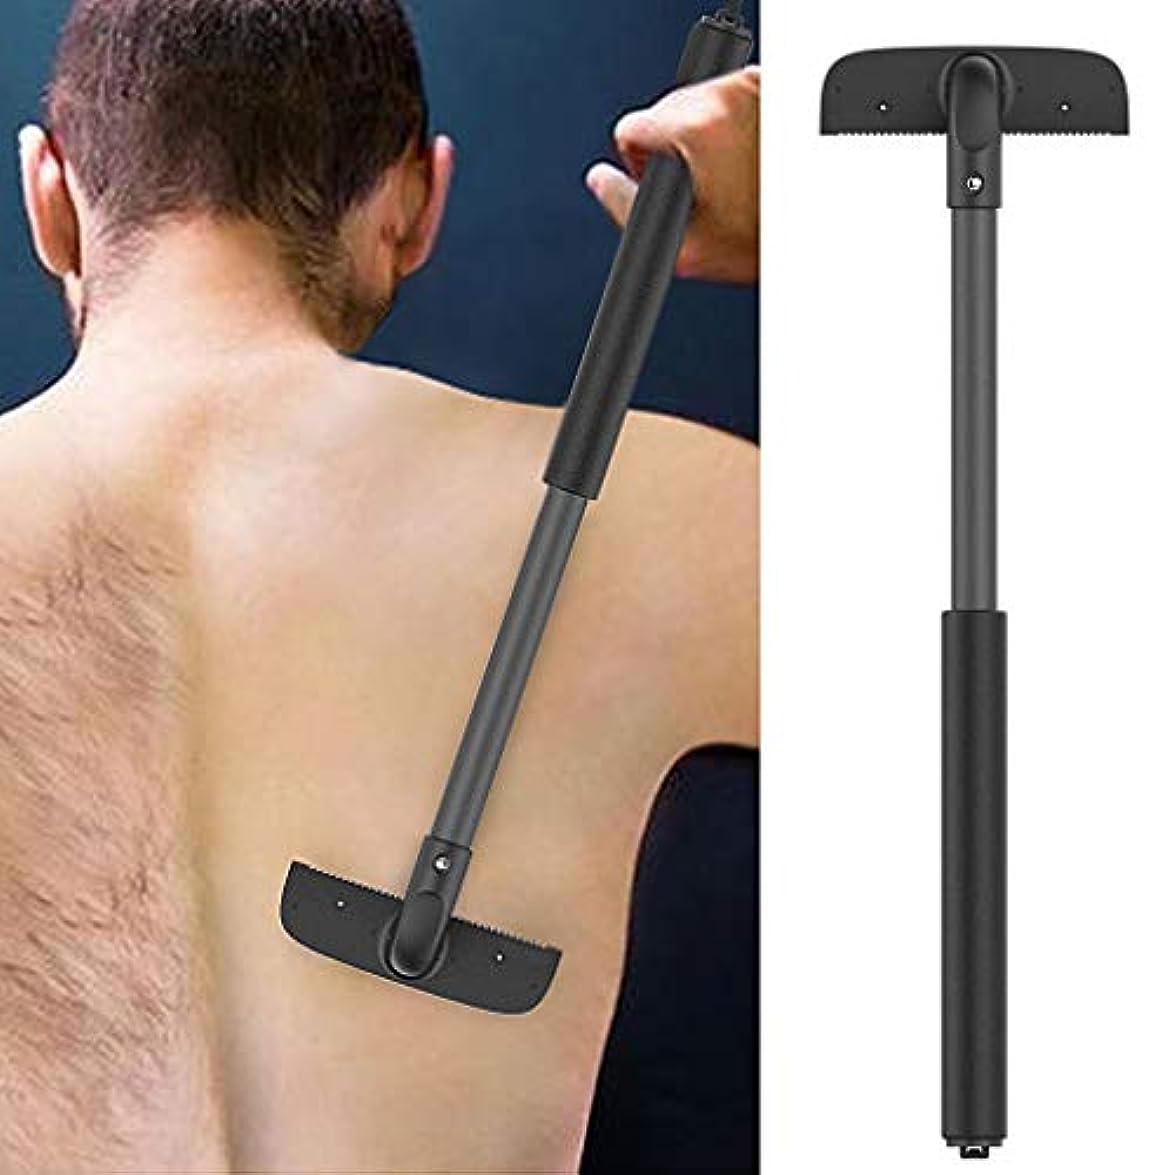 Back Hair Removal And Body Shaver、バックヘアとボディシェーバー、男性のための剃刀、調節可能なハンドル、伸縮可能なトリマー剃刀脱毛装置 除毛 ムダ毛処理